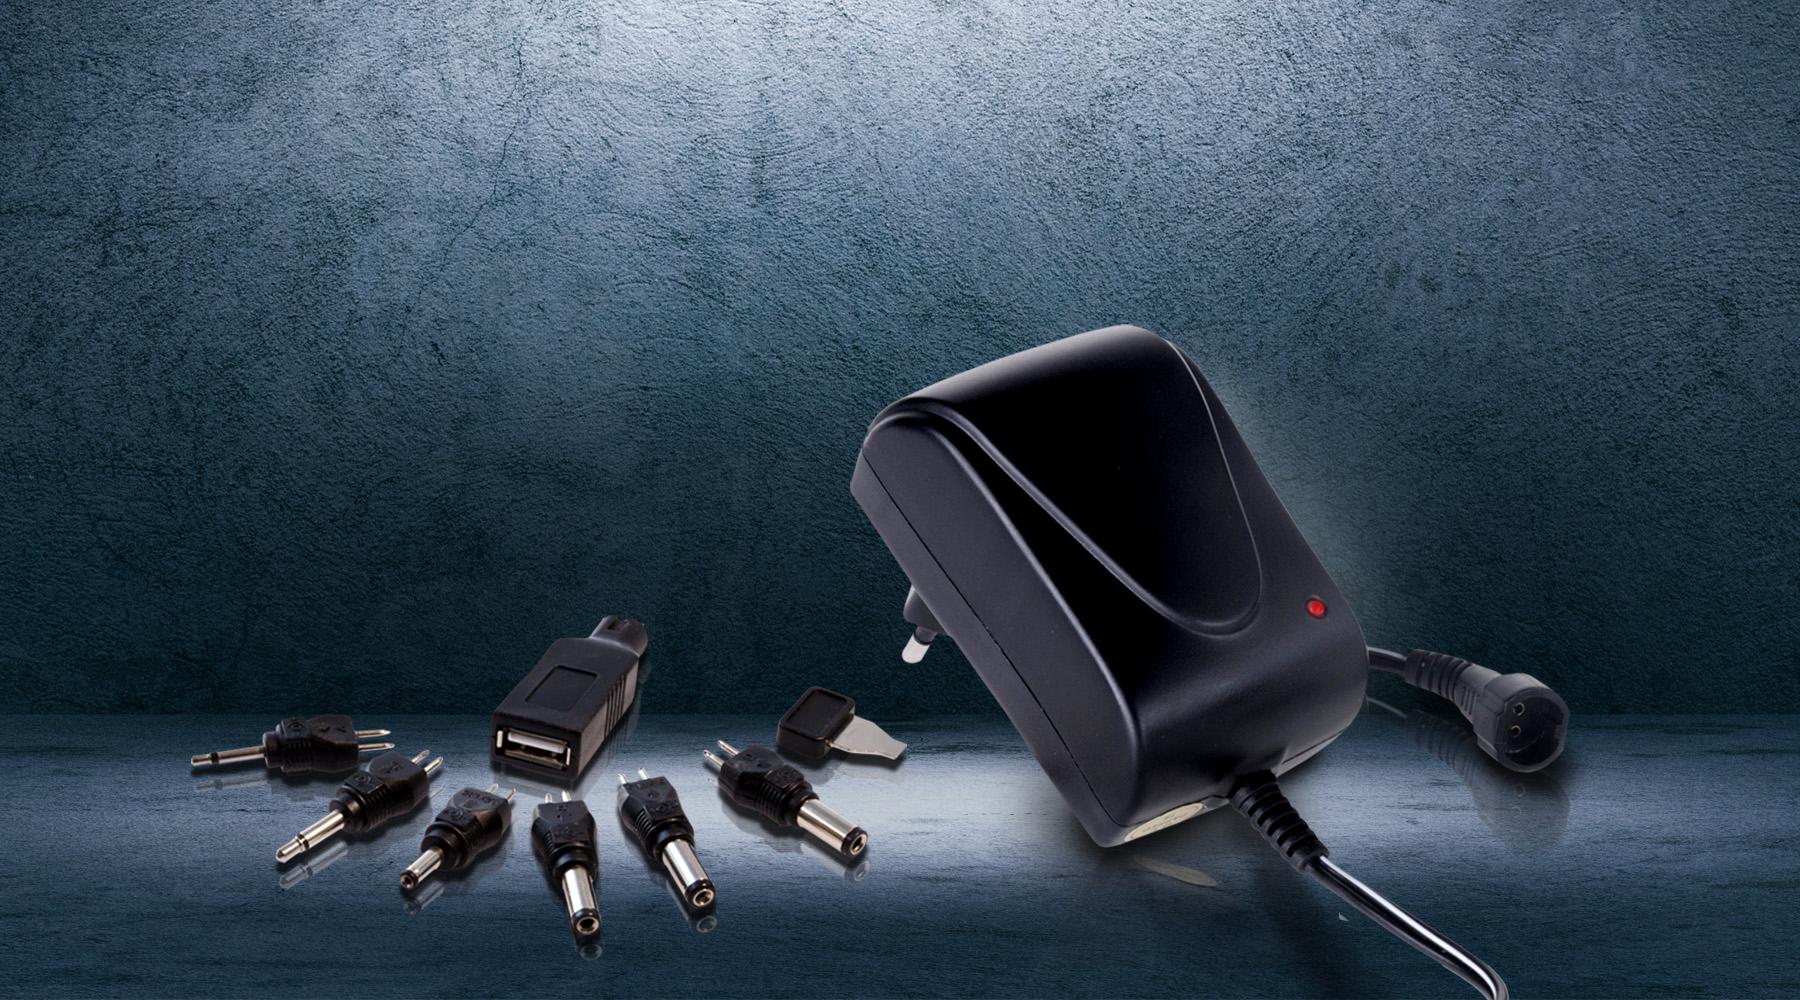 Universal plug-in power supplies